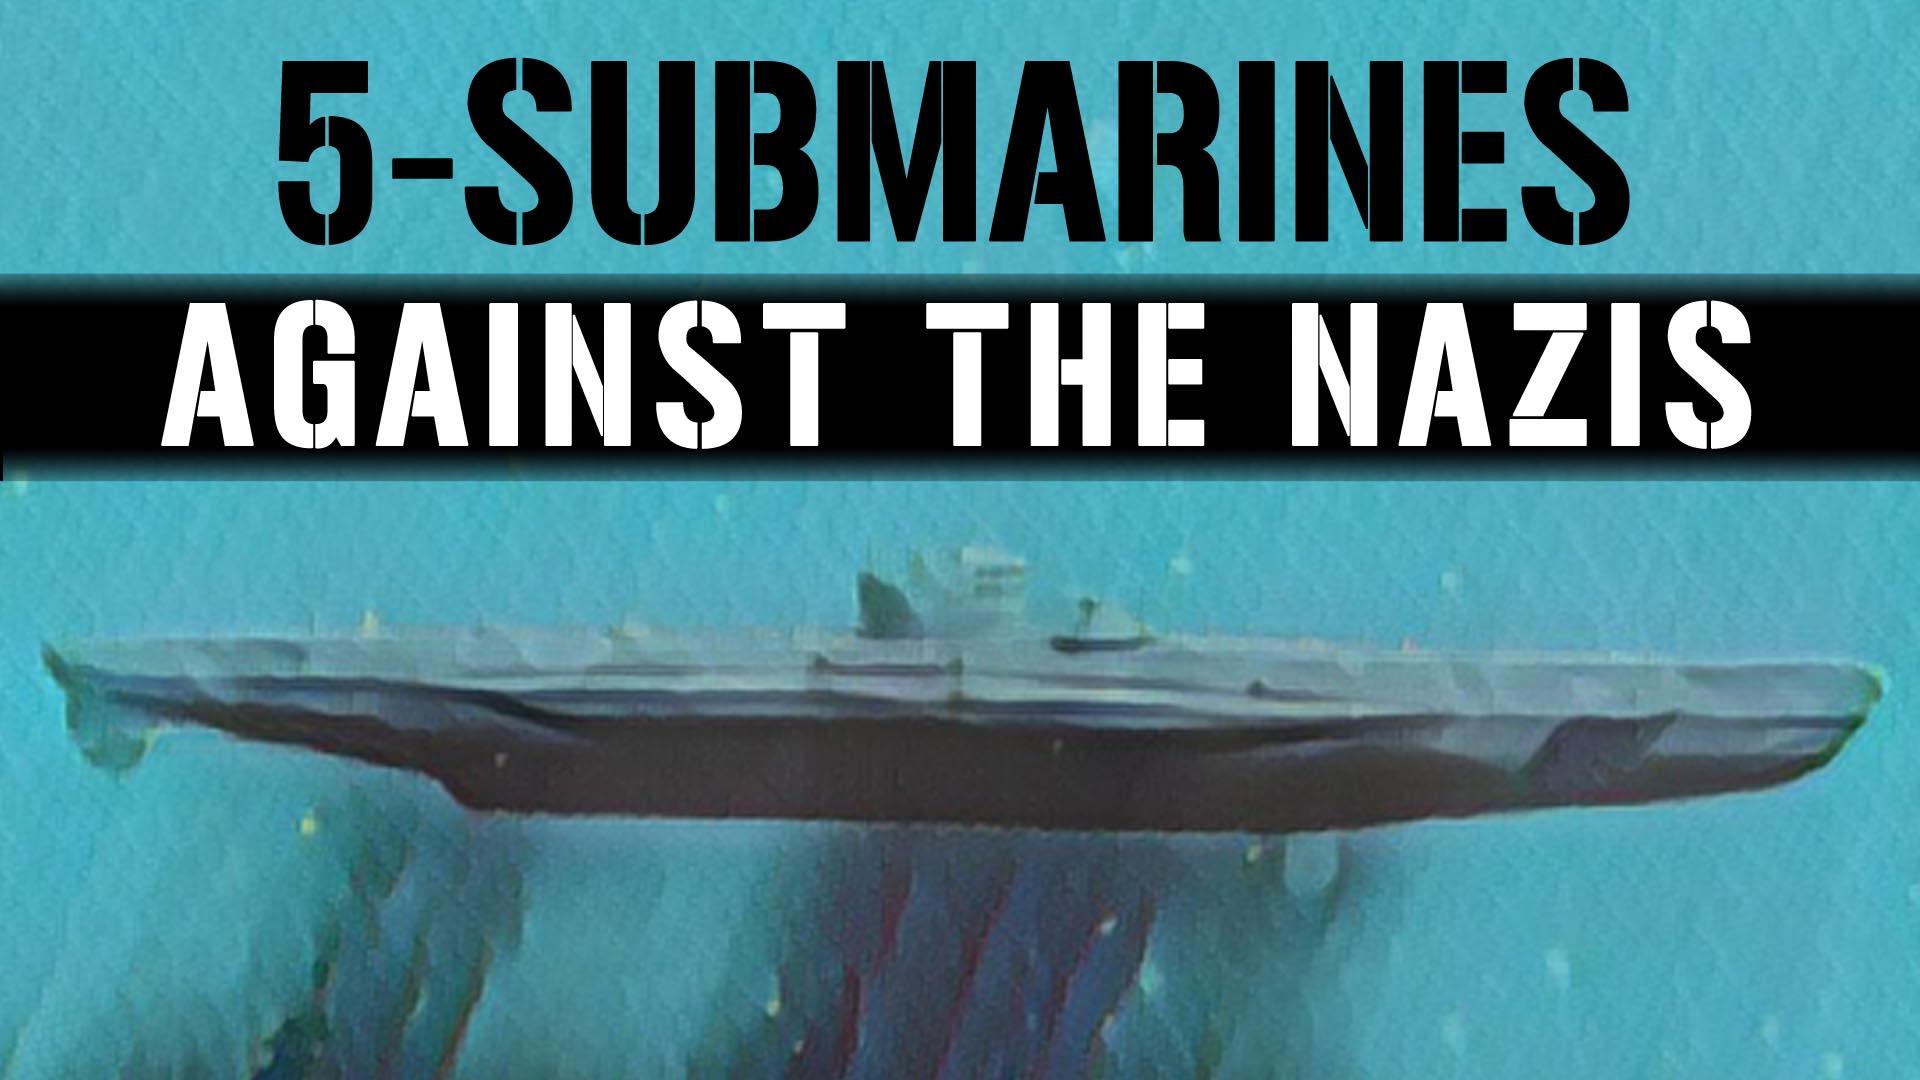 5 Submarines Against the Nazis